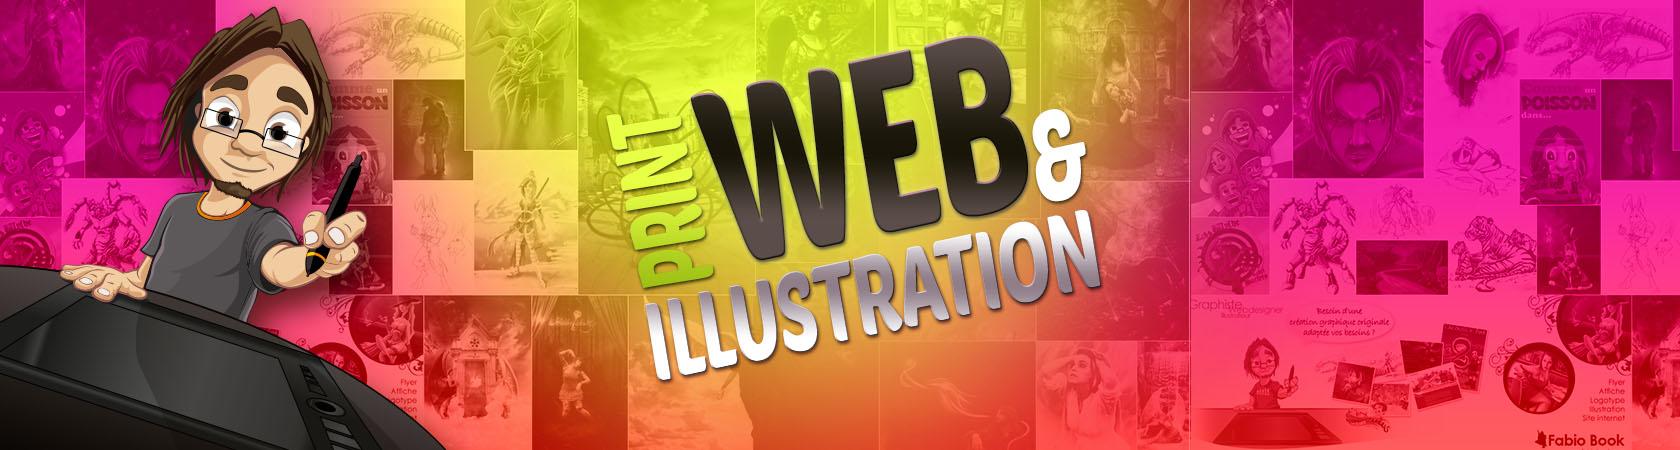 Fabio Roulet graphiste illustrateur et webdesigner freelance